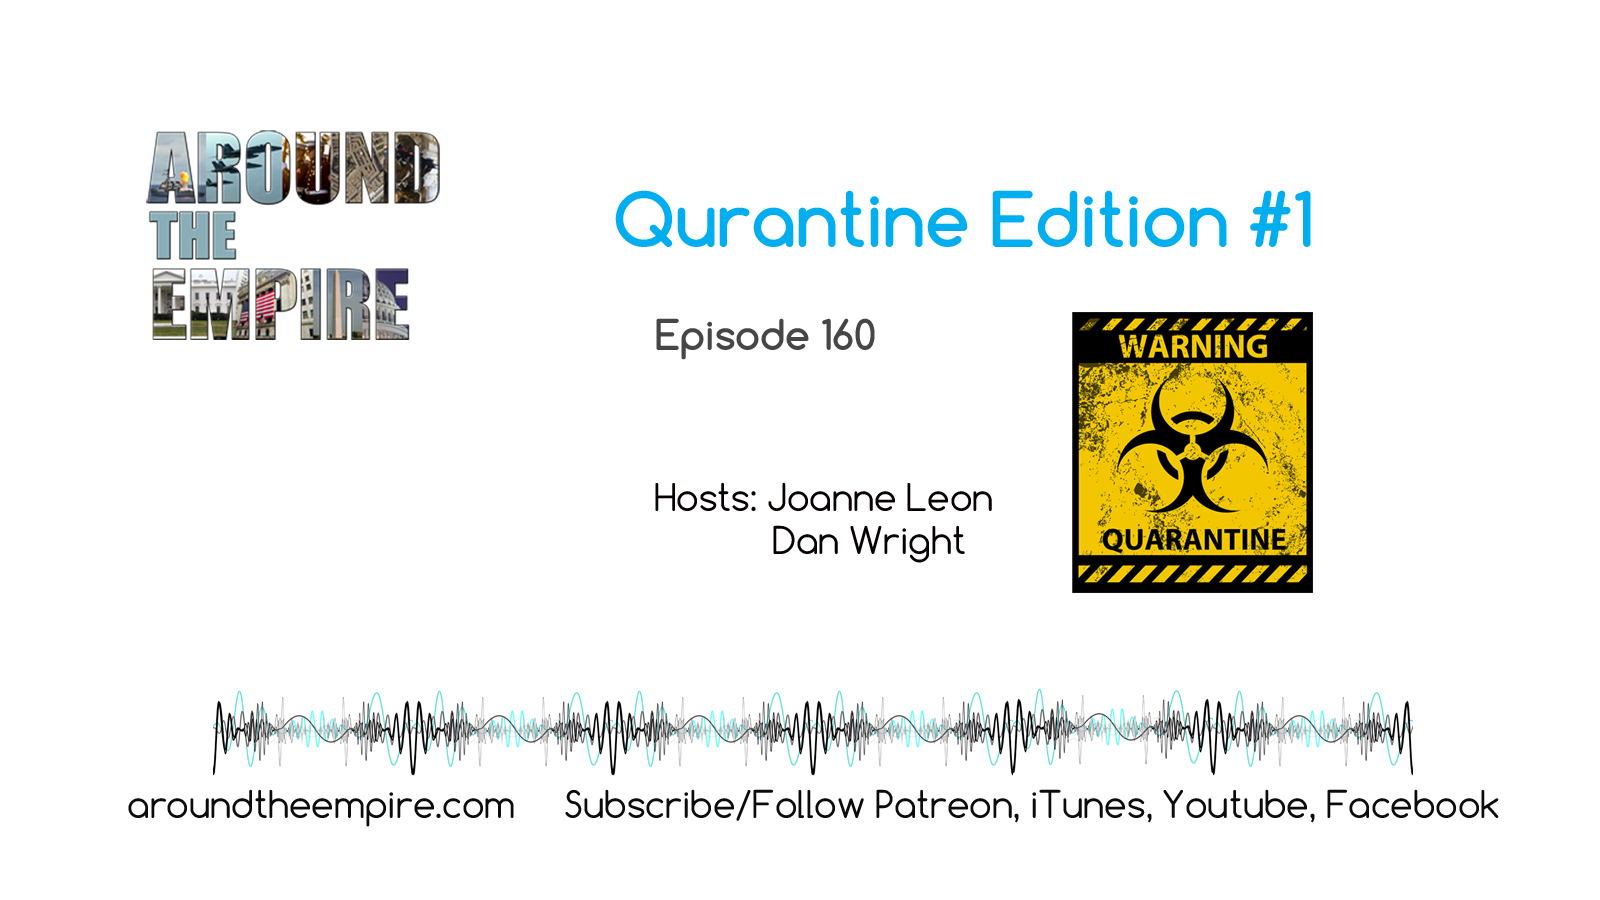 Ep 160 UNLOCKED Quarantine Edition #1